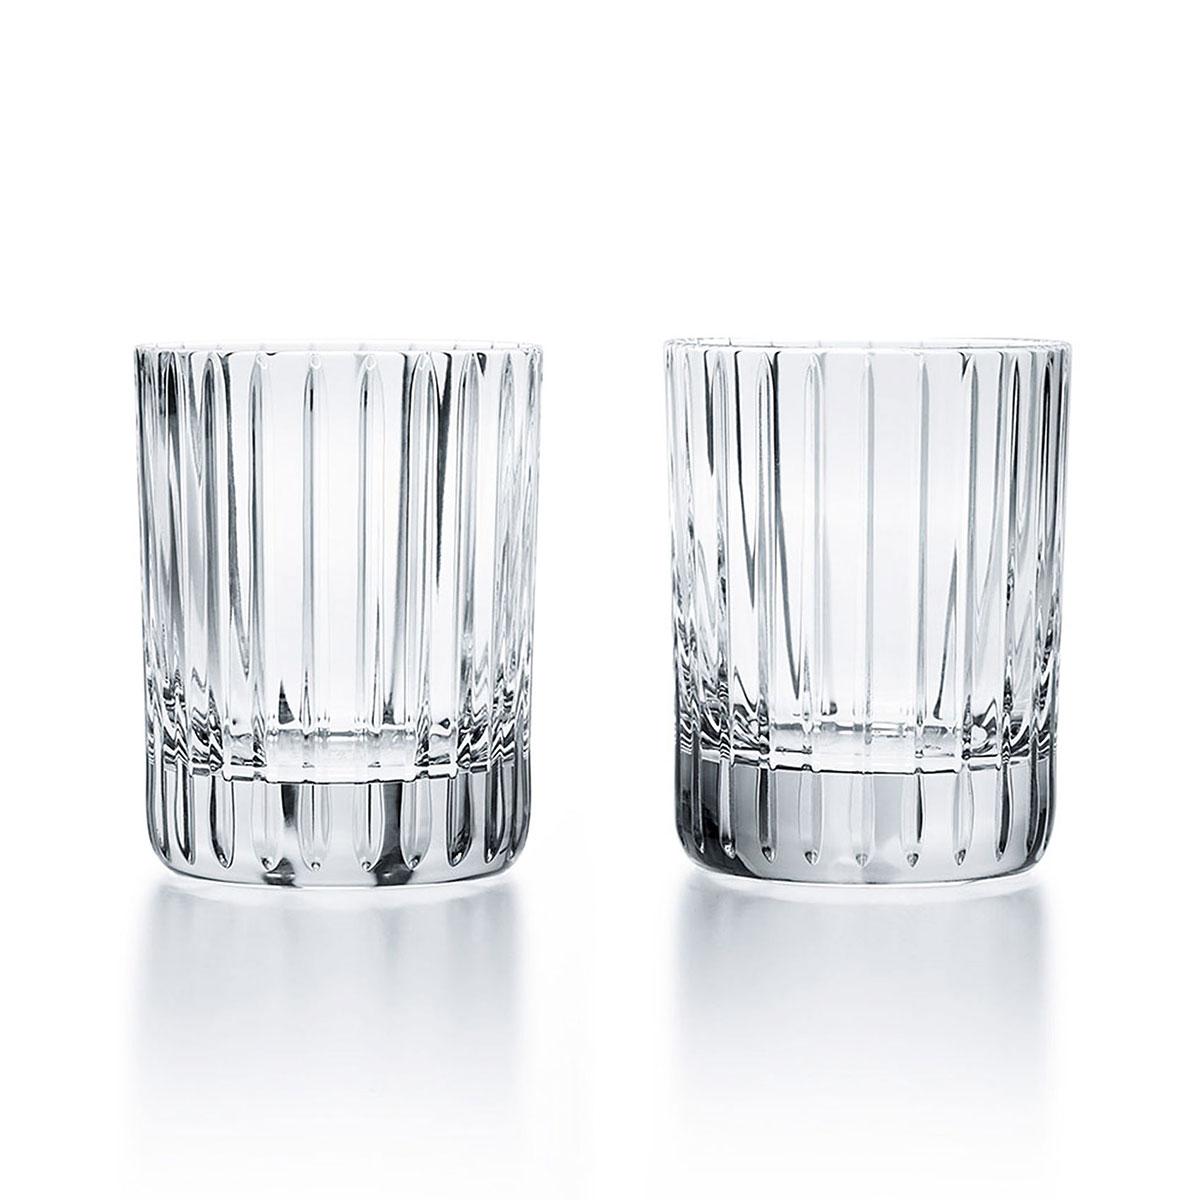 Baccarat Crystal, Harmonie DOF Tumbler, Pair